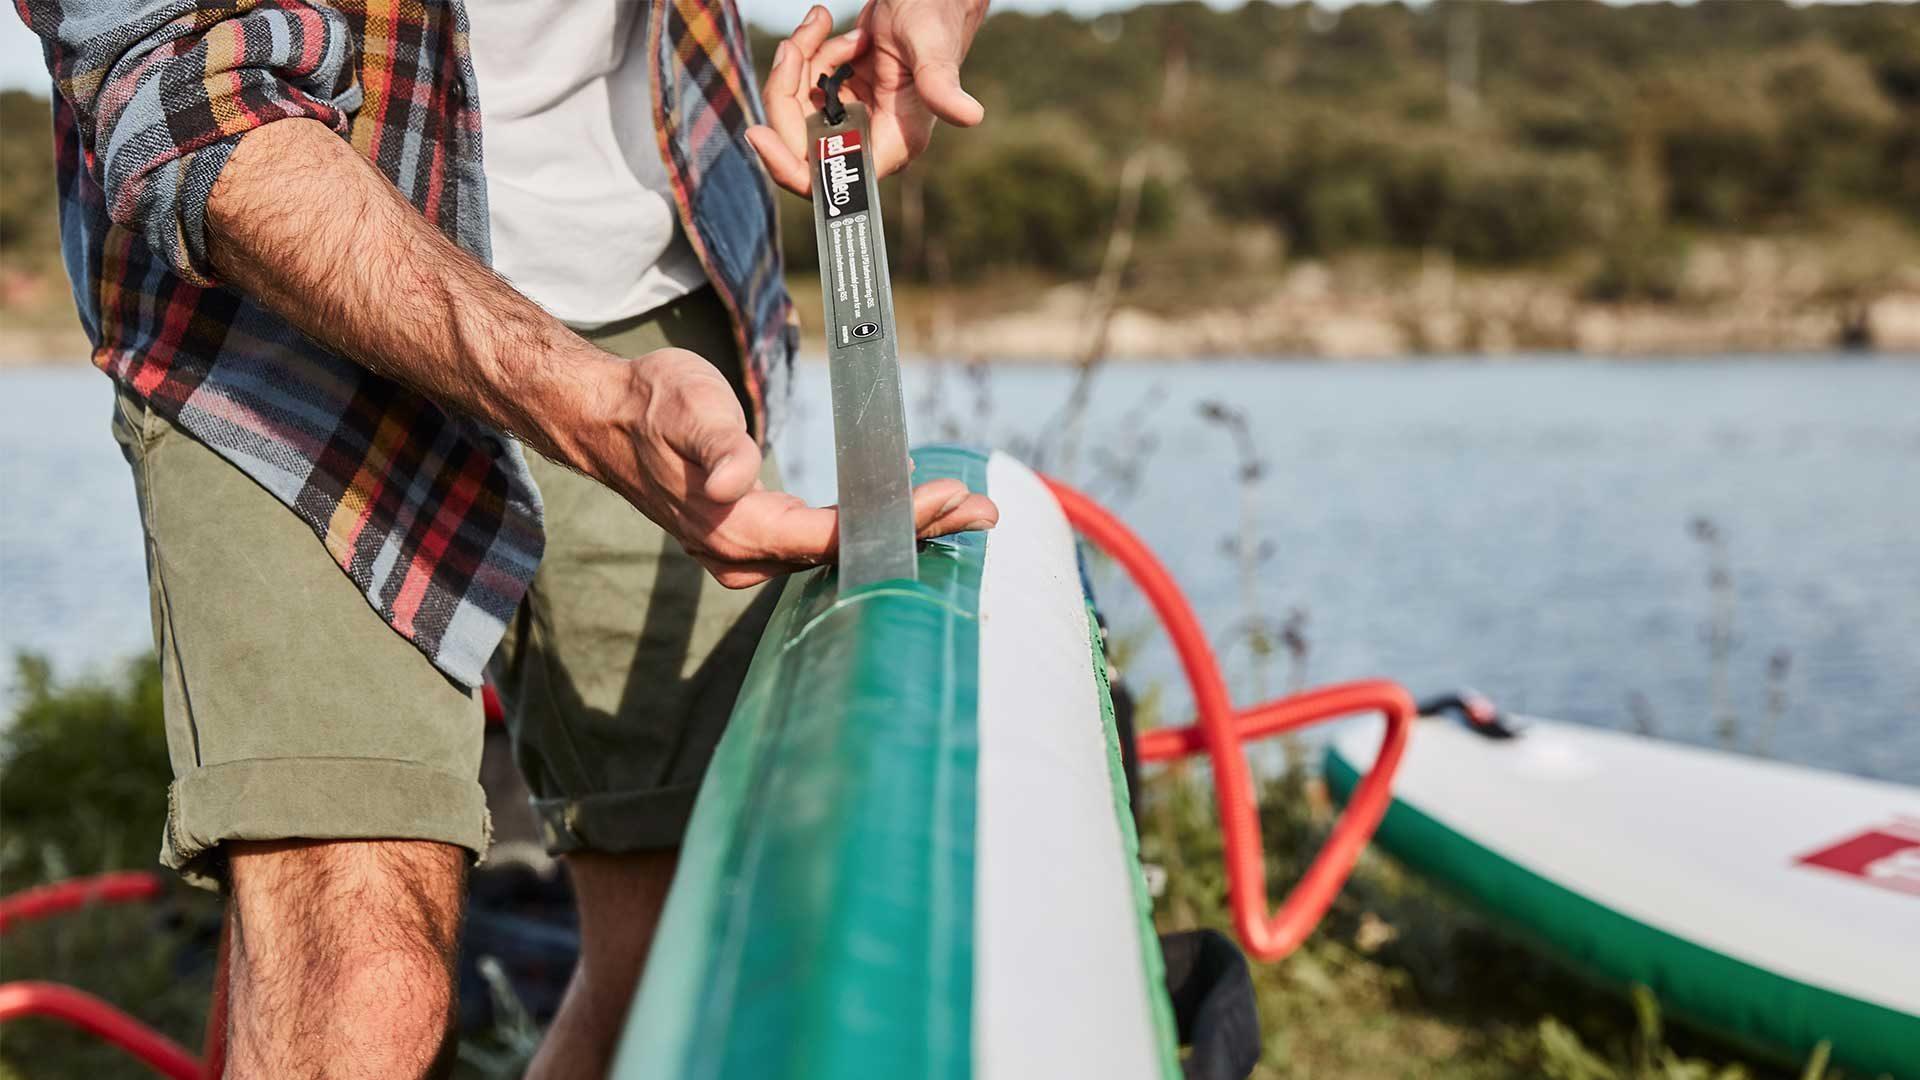 redpaddleco-150-voyager-tandem-inflatable-paddle-board-desktop-gallery-valve